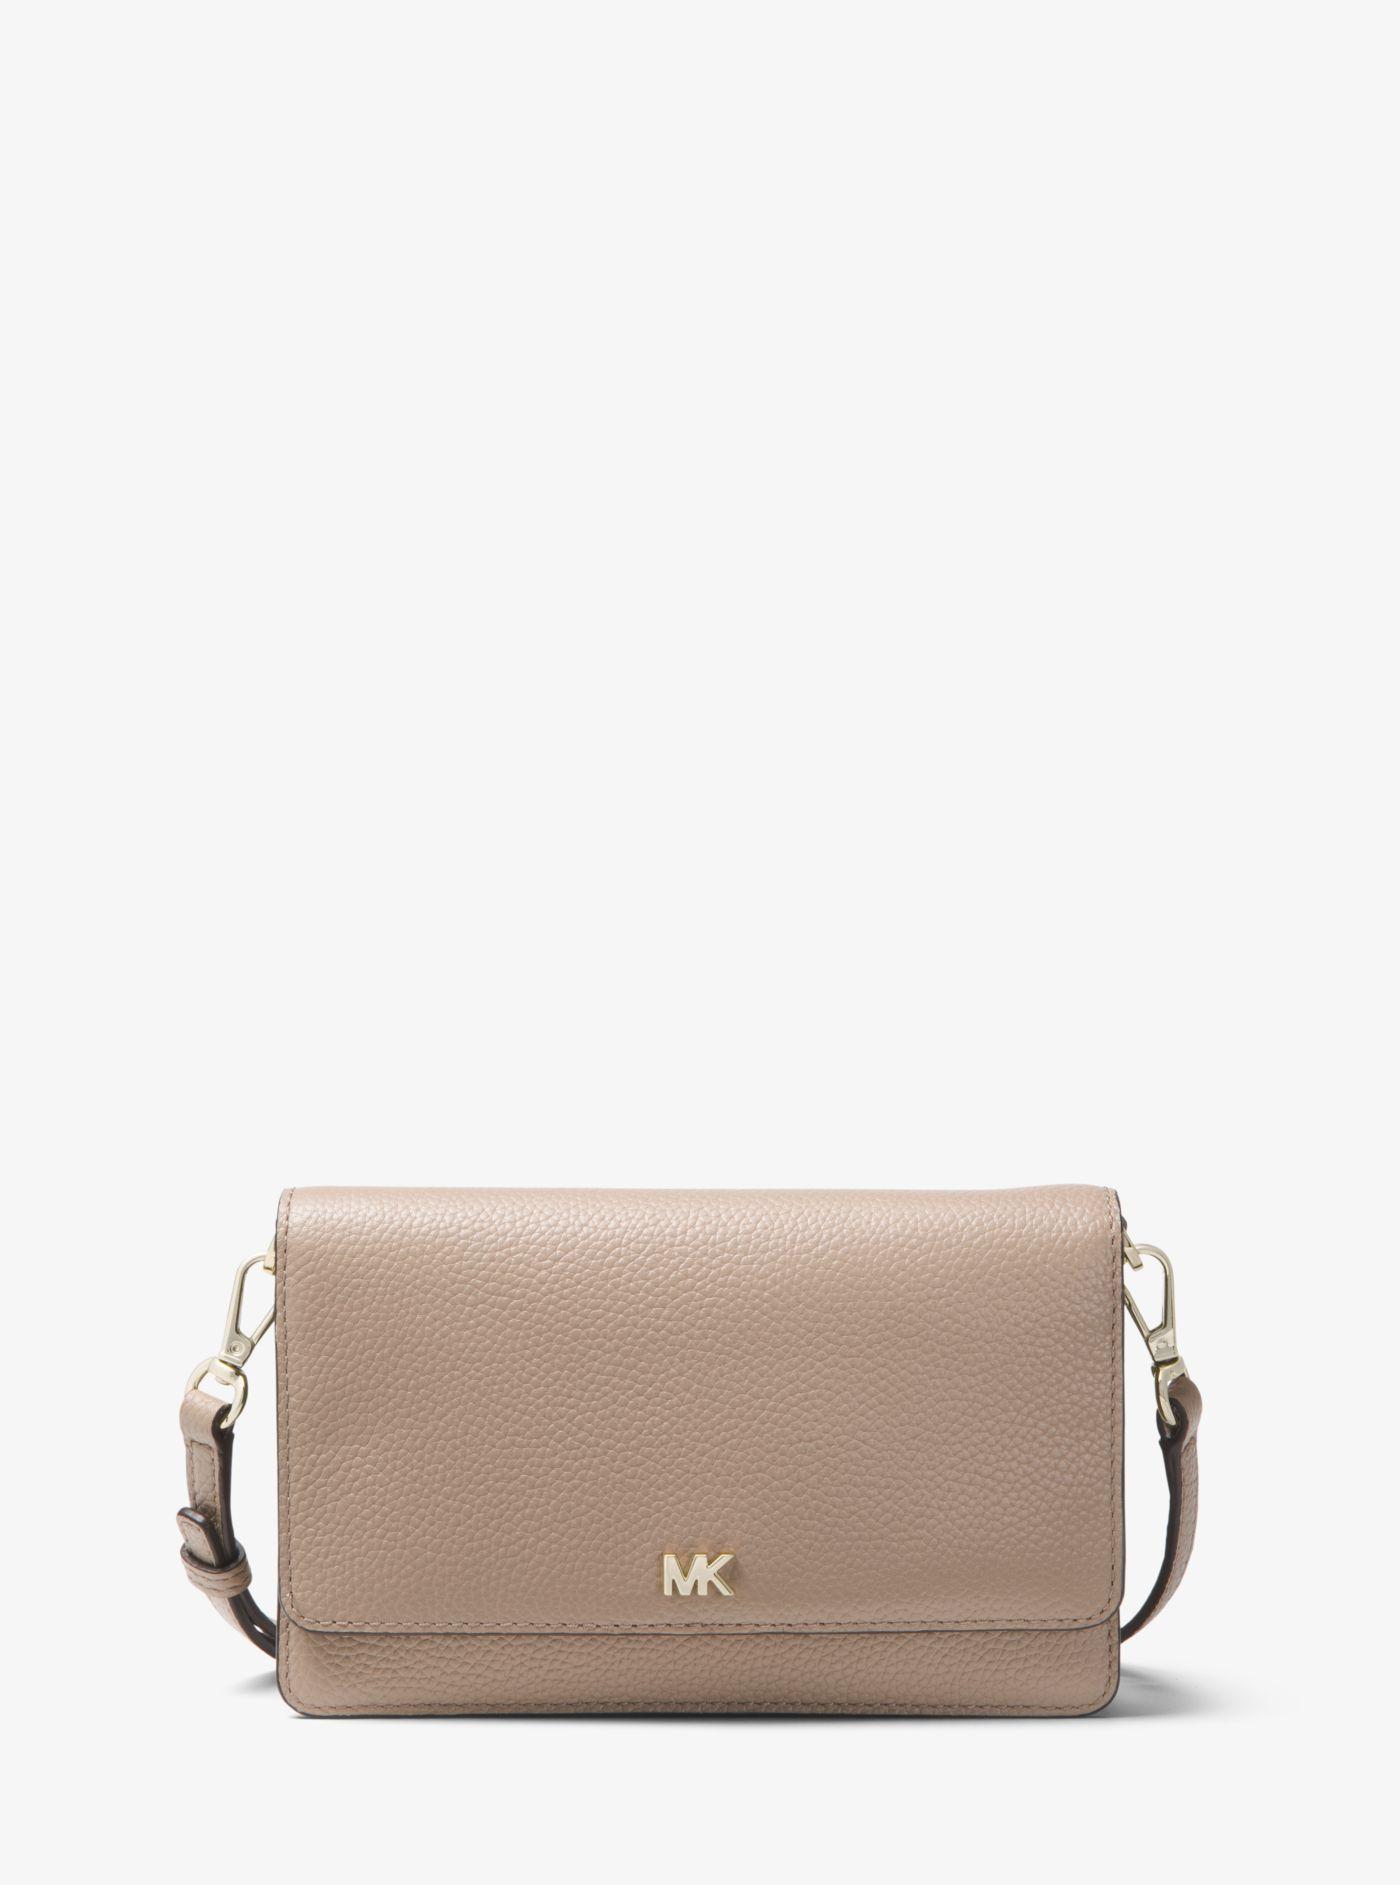 c58f400f959e Michael Kors. Women s Pebbled Leather Convertible Crossbody